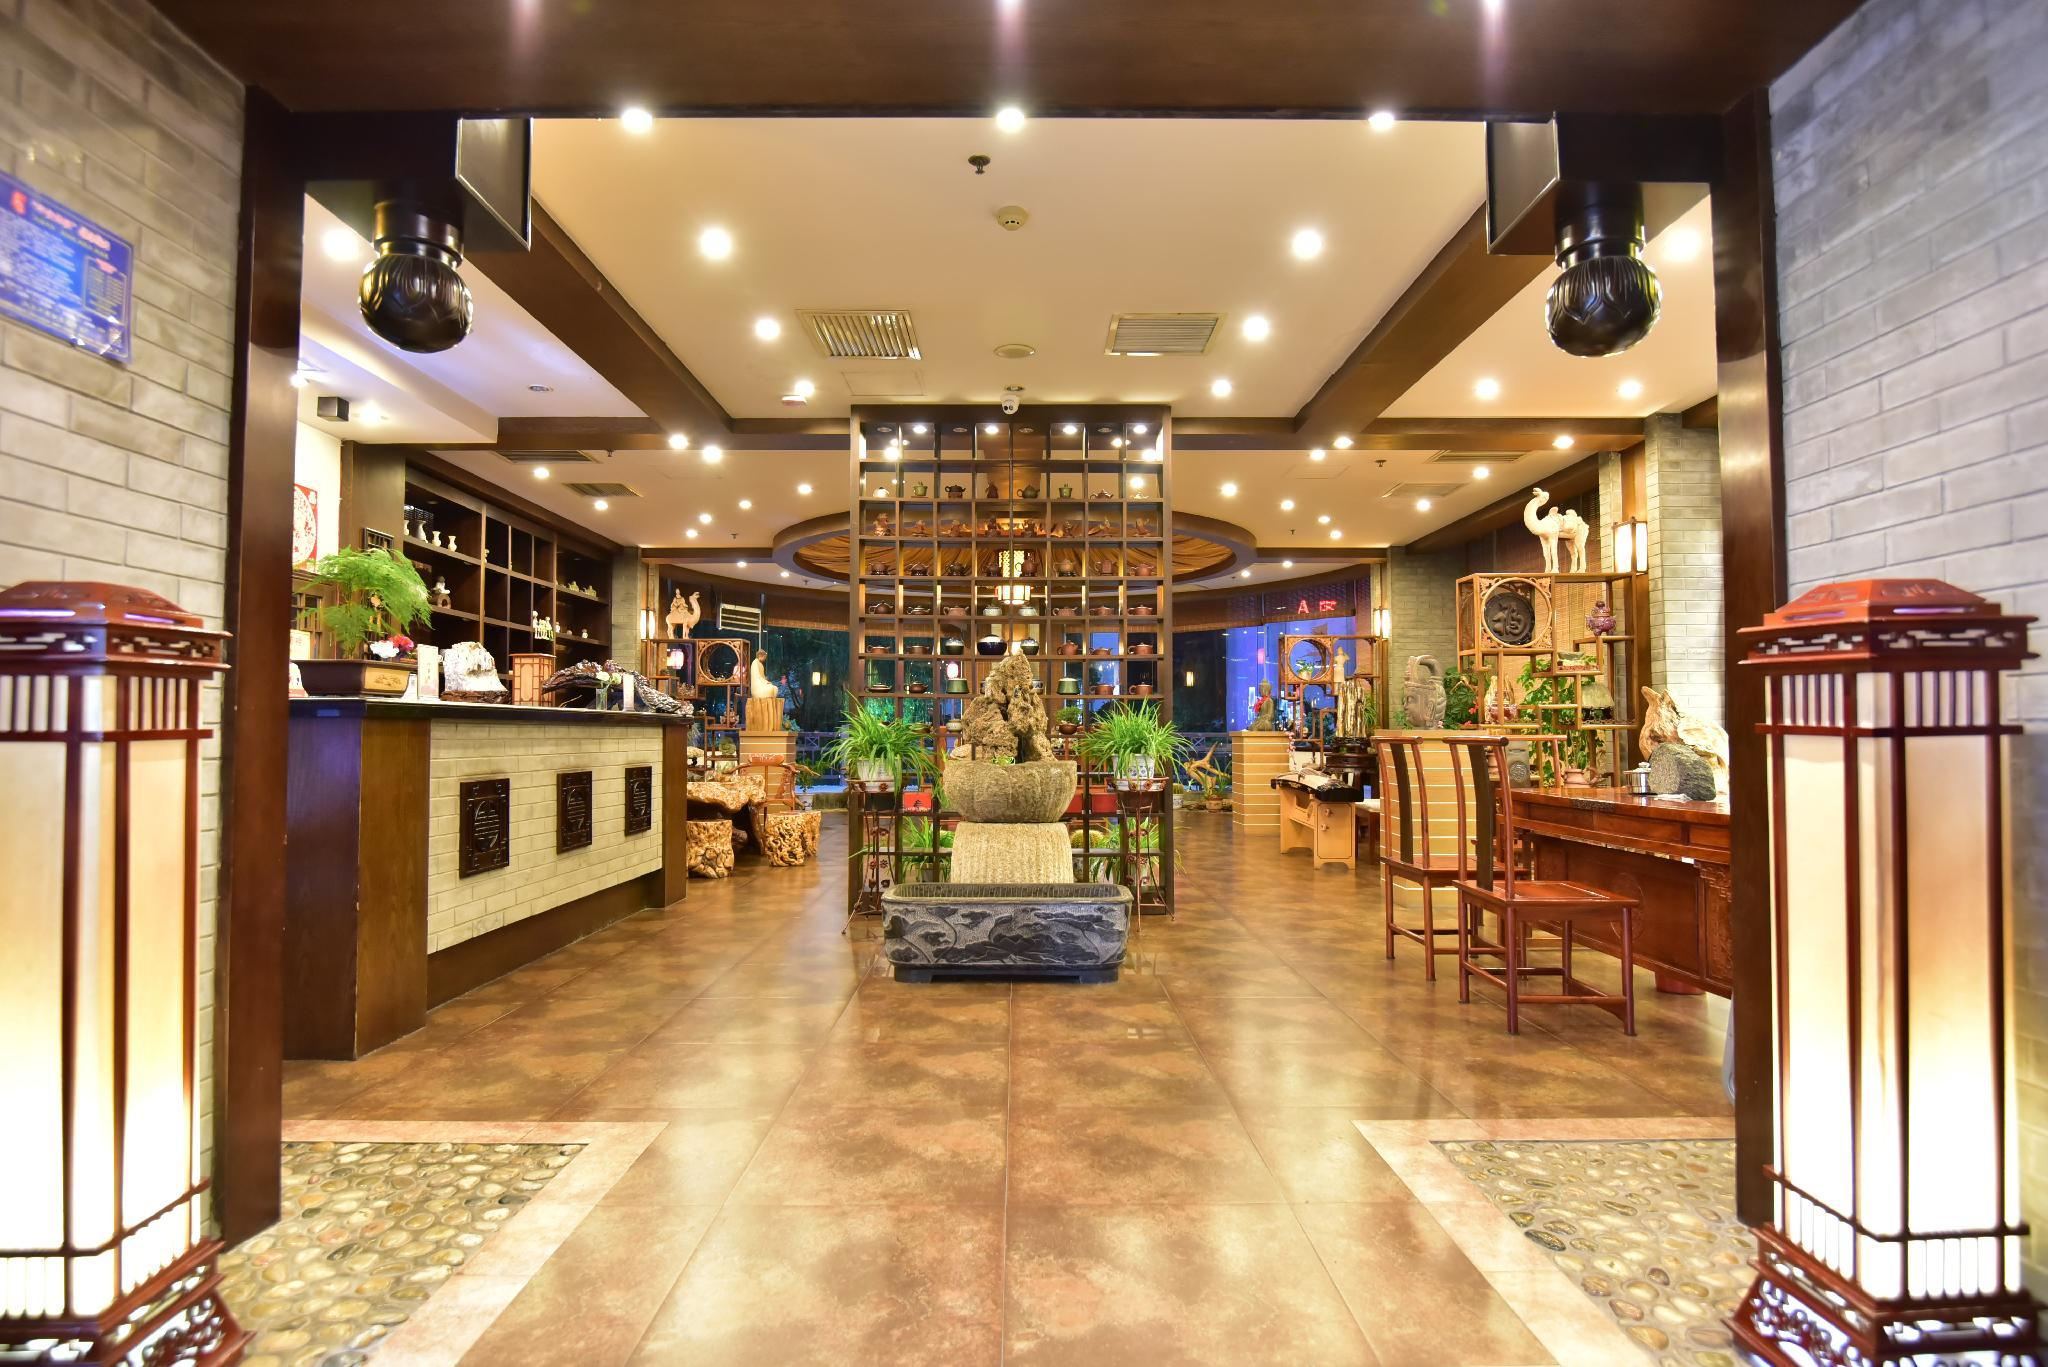 Huashan Hotel Hotel Theme Of Chivalrous Culture